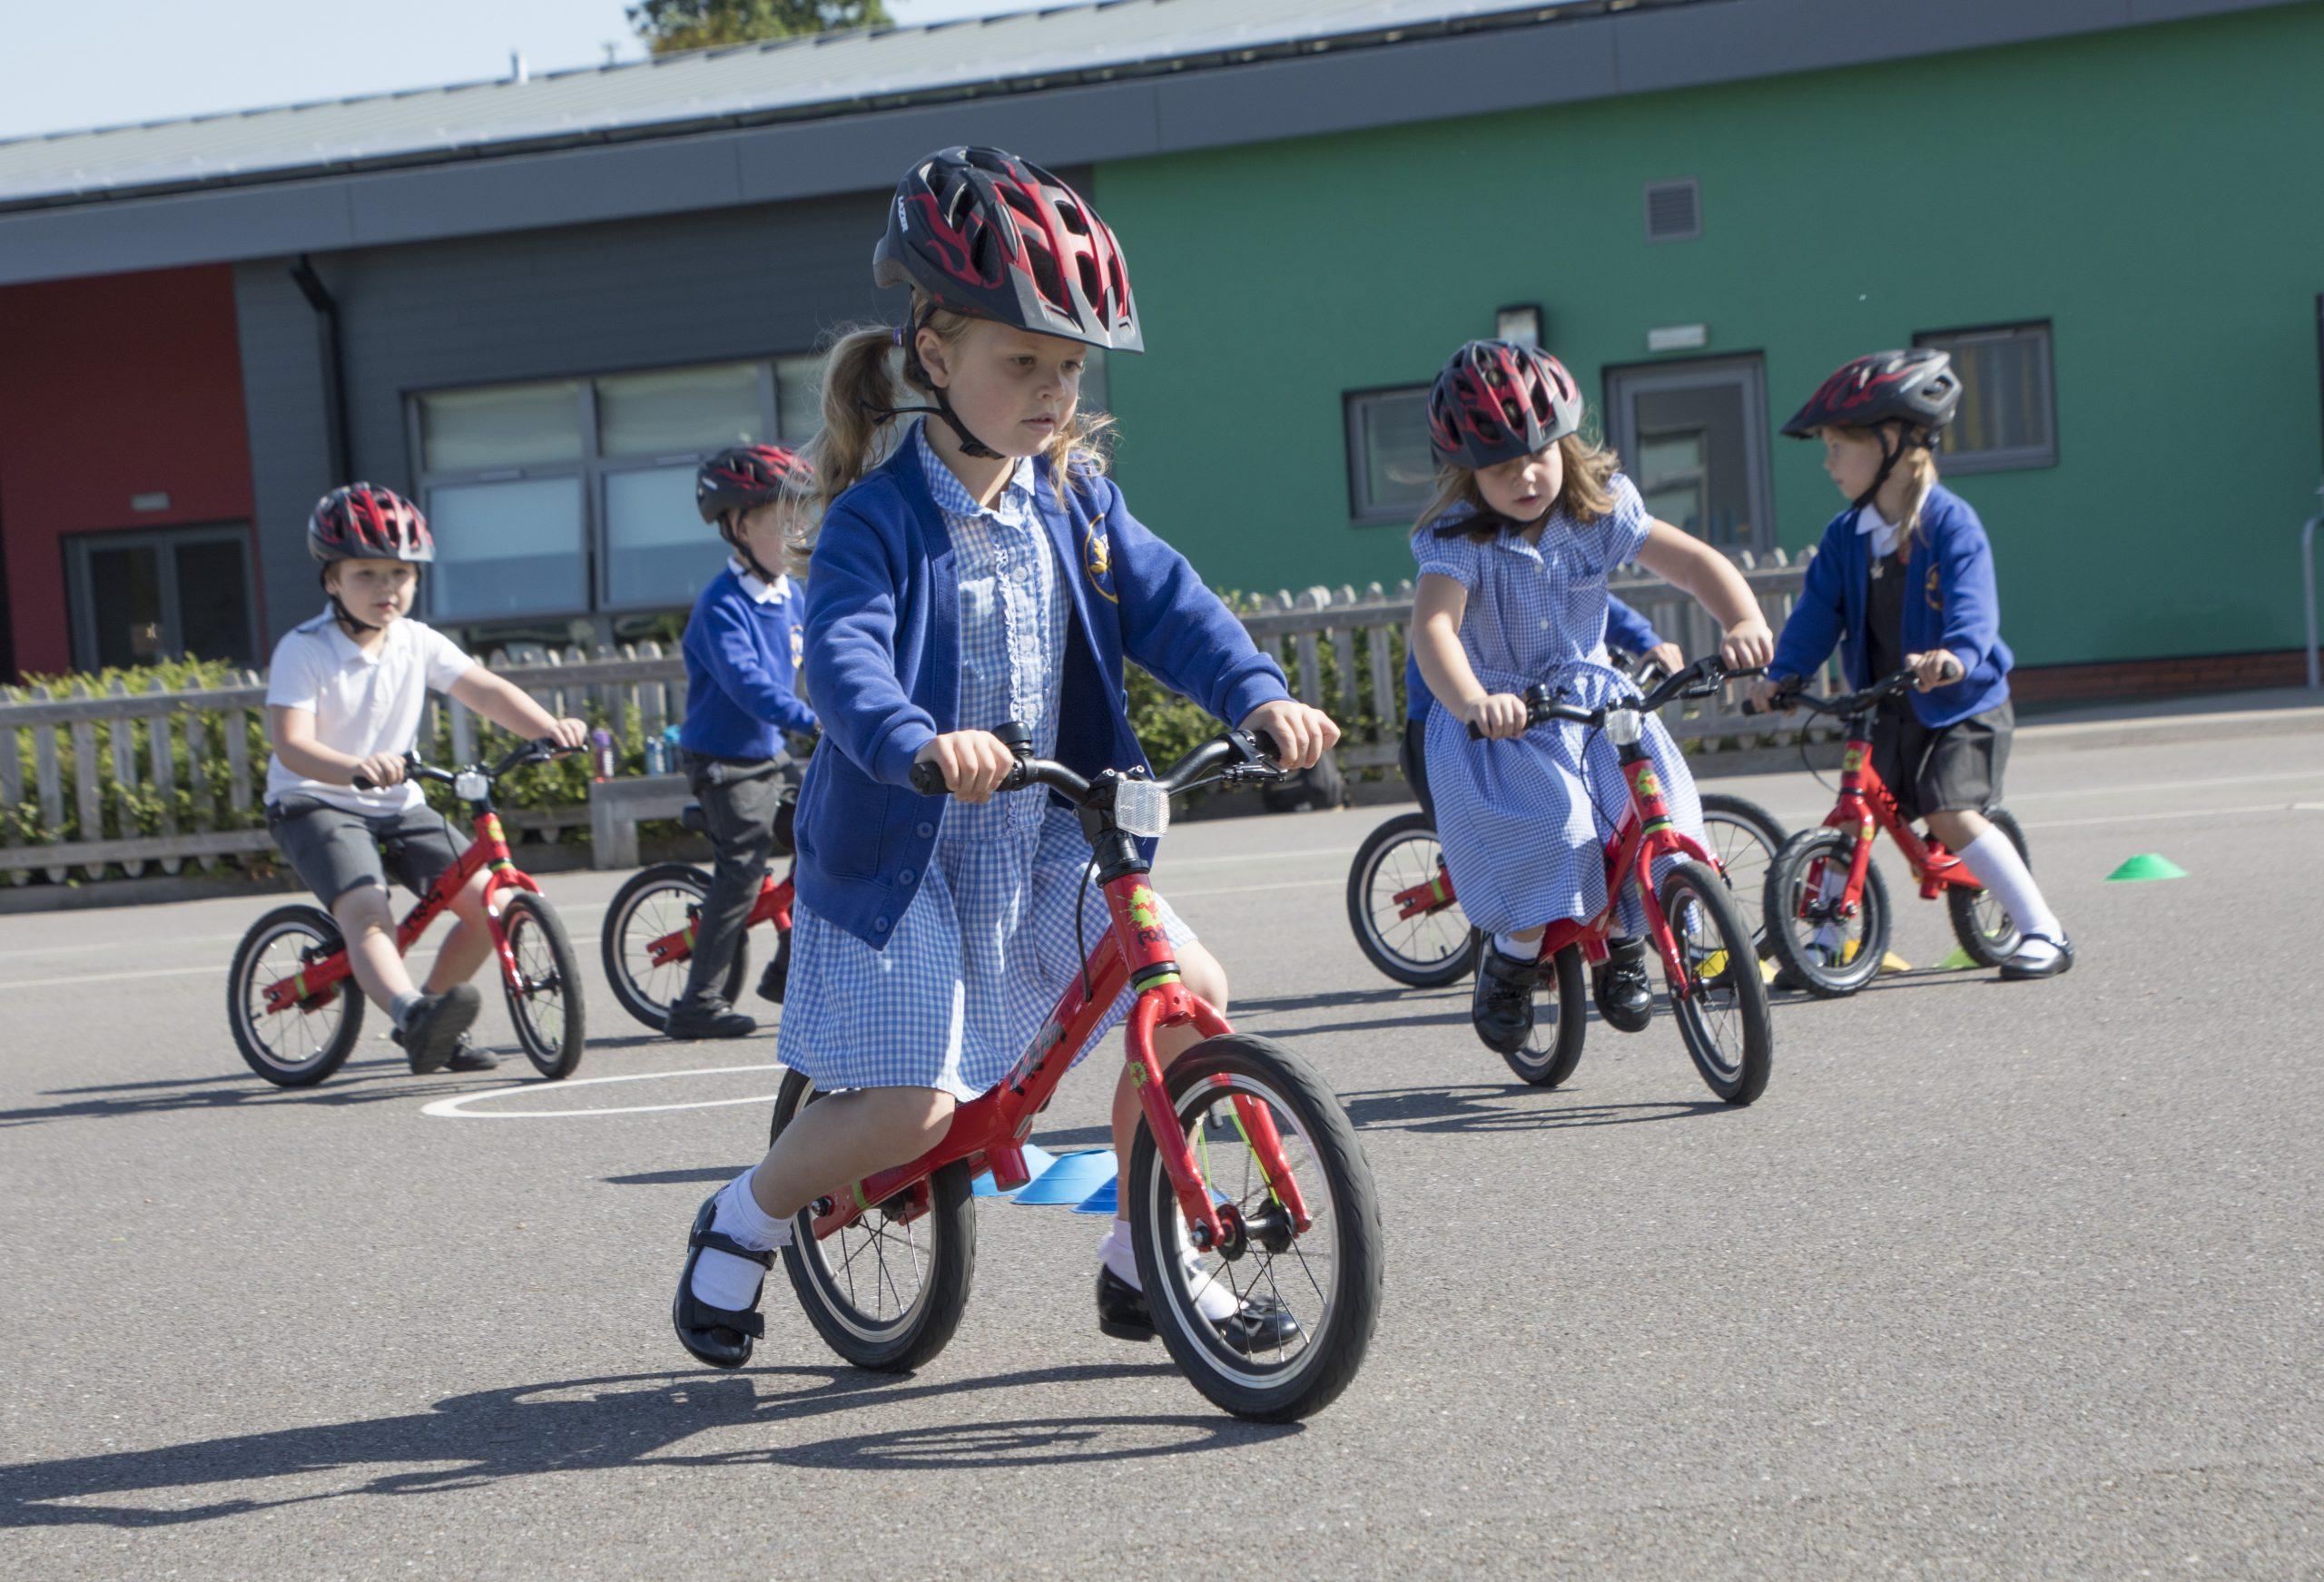 Young children in school uniform riding balance bikes